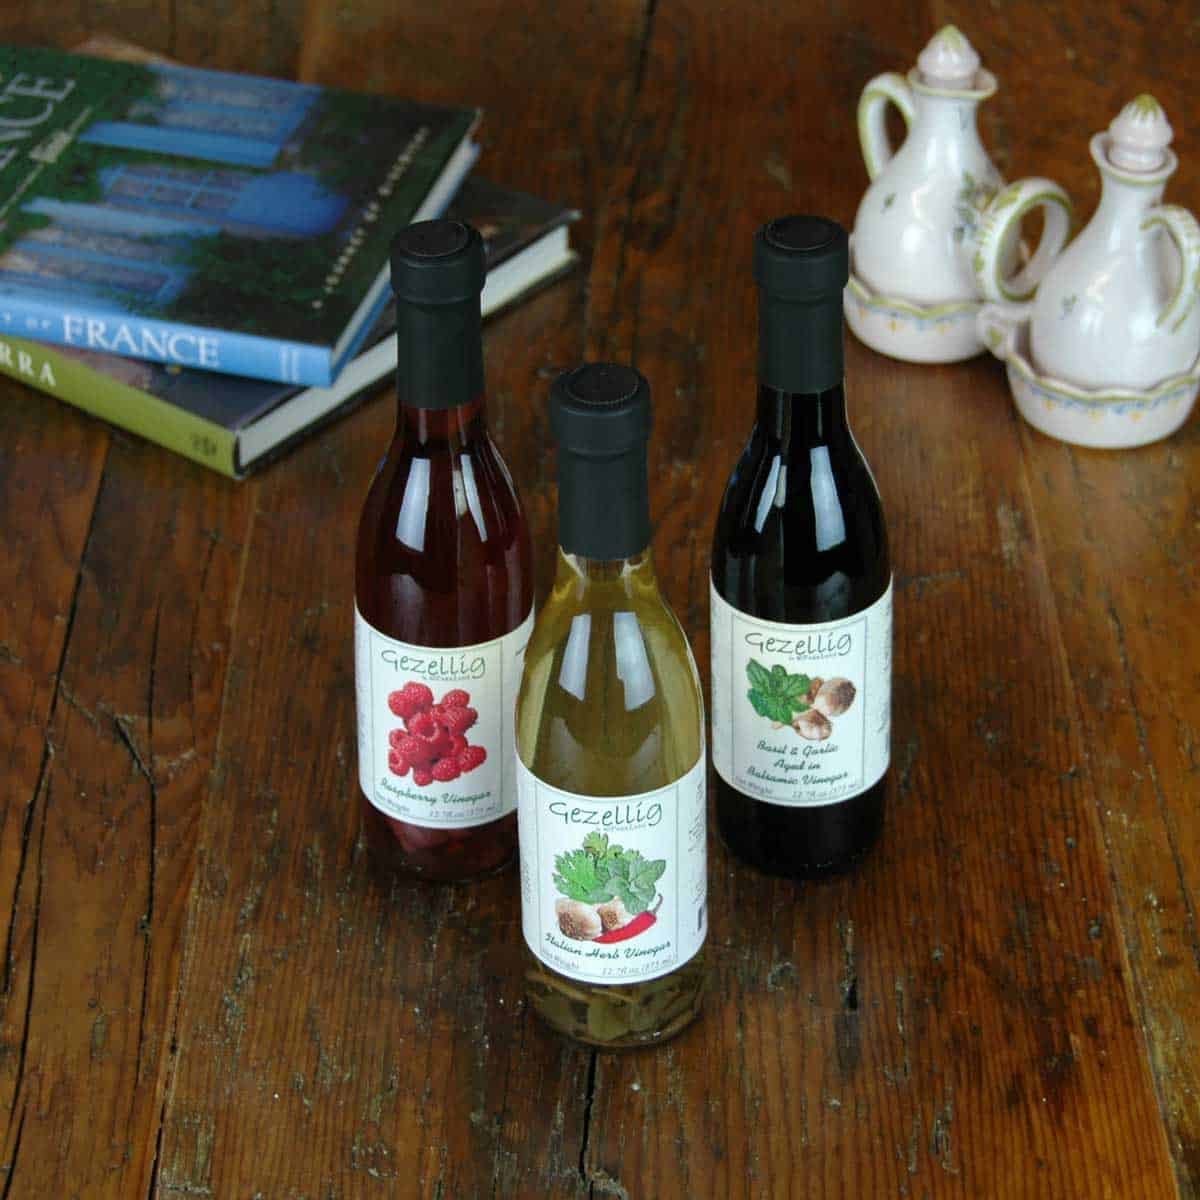 Gezellig Vinegar